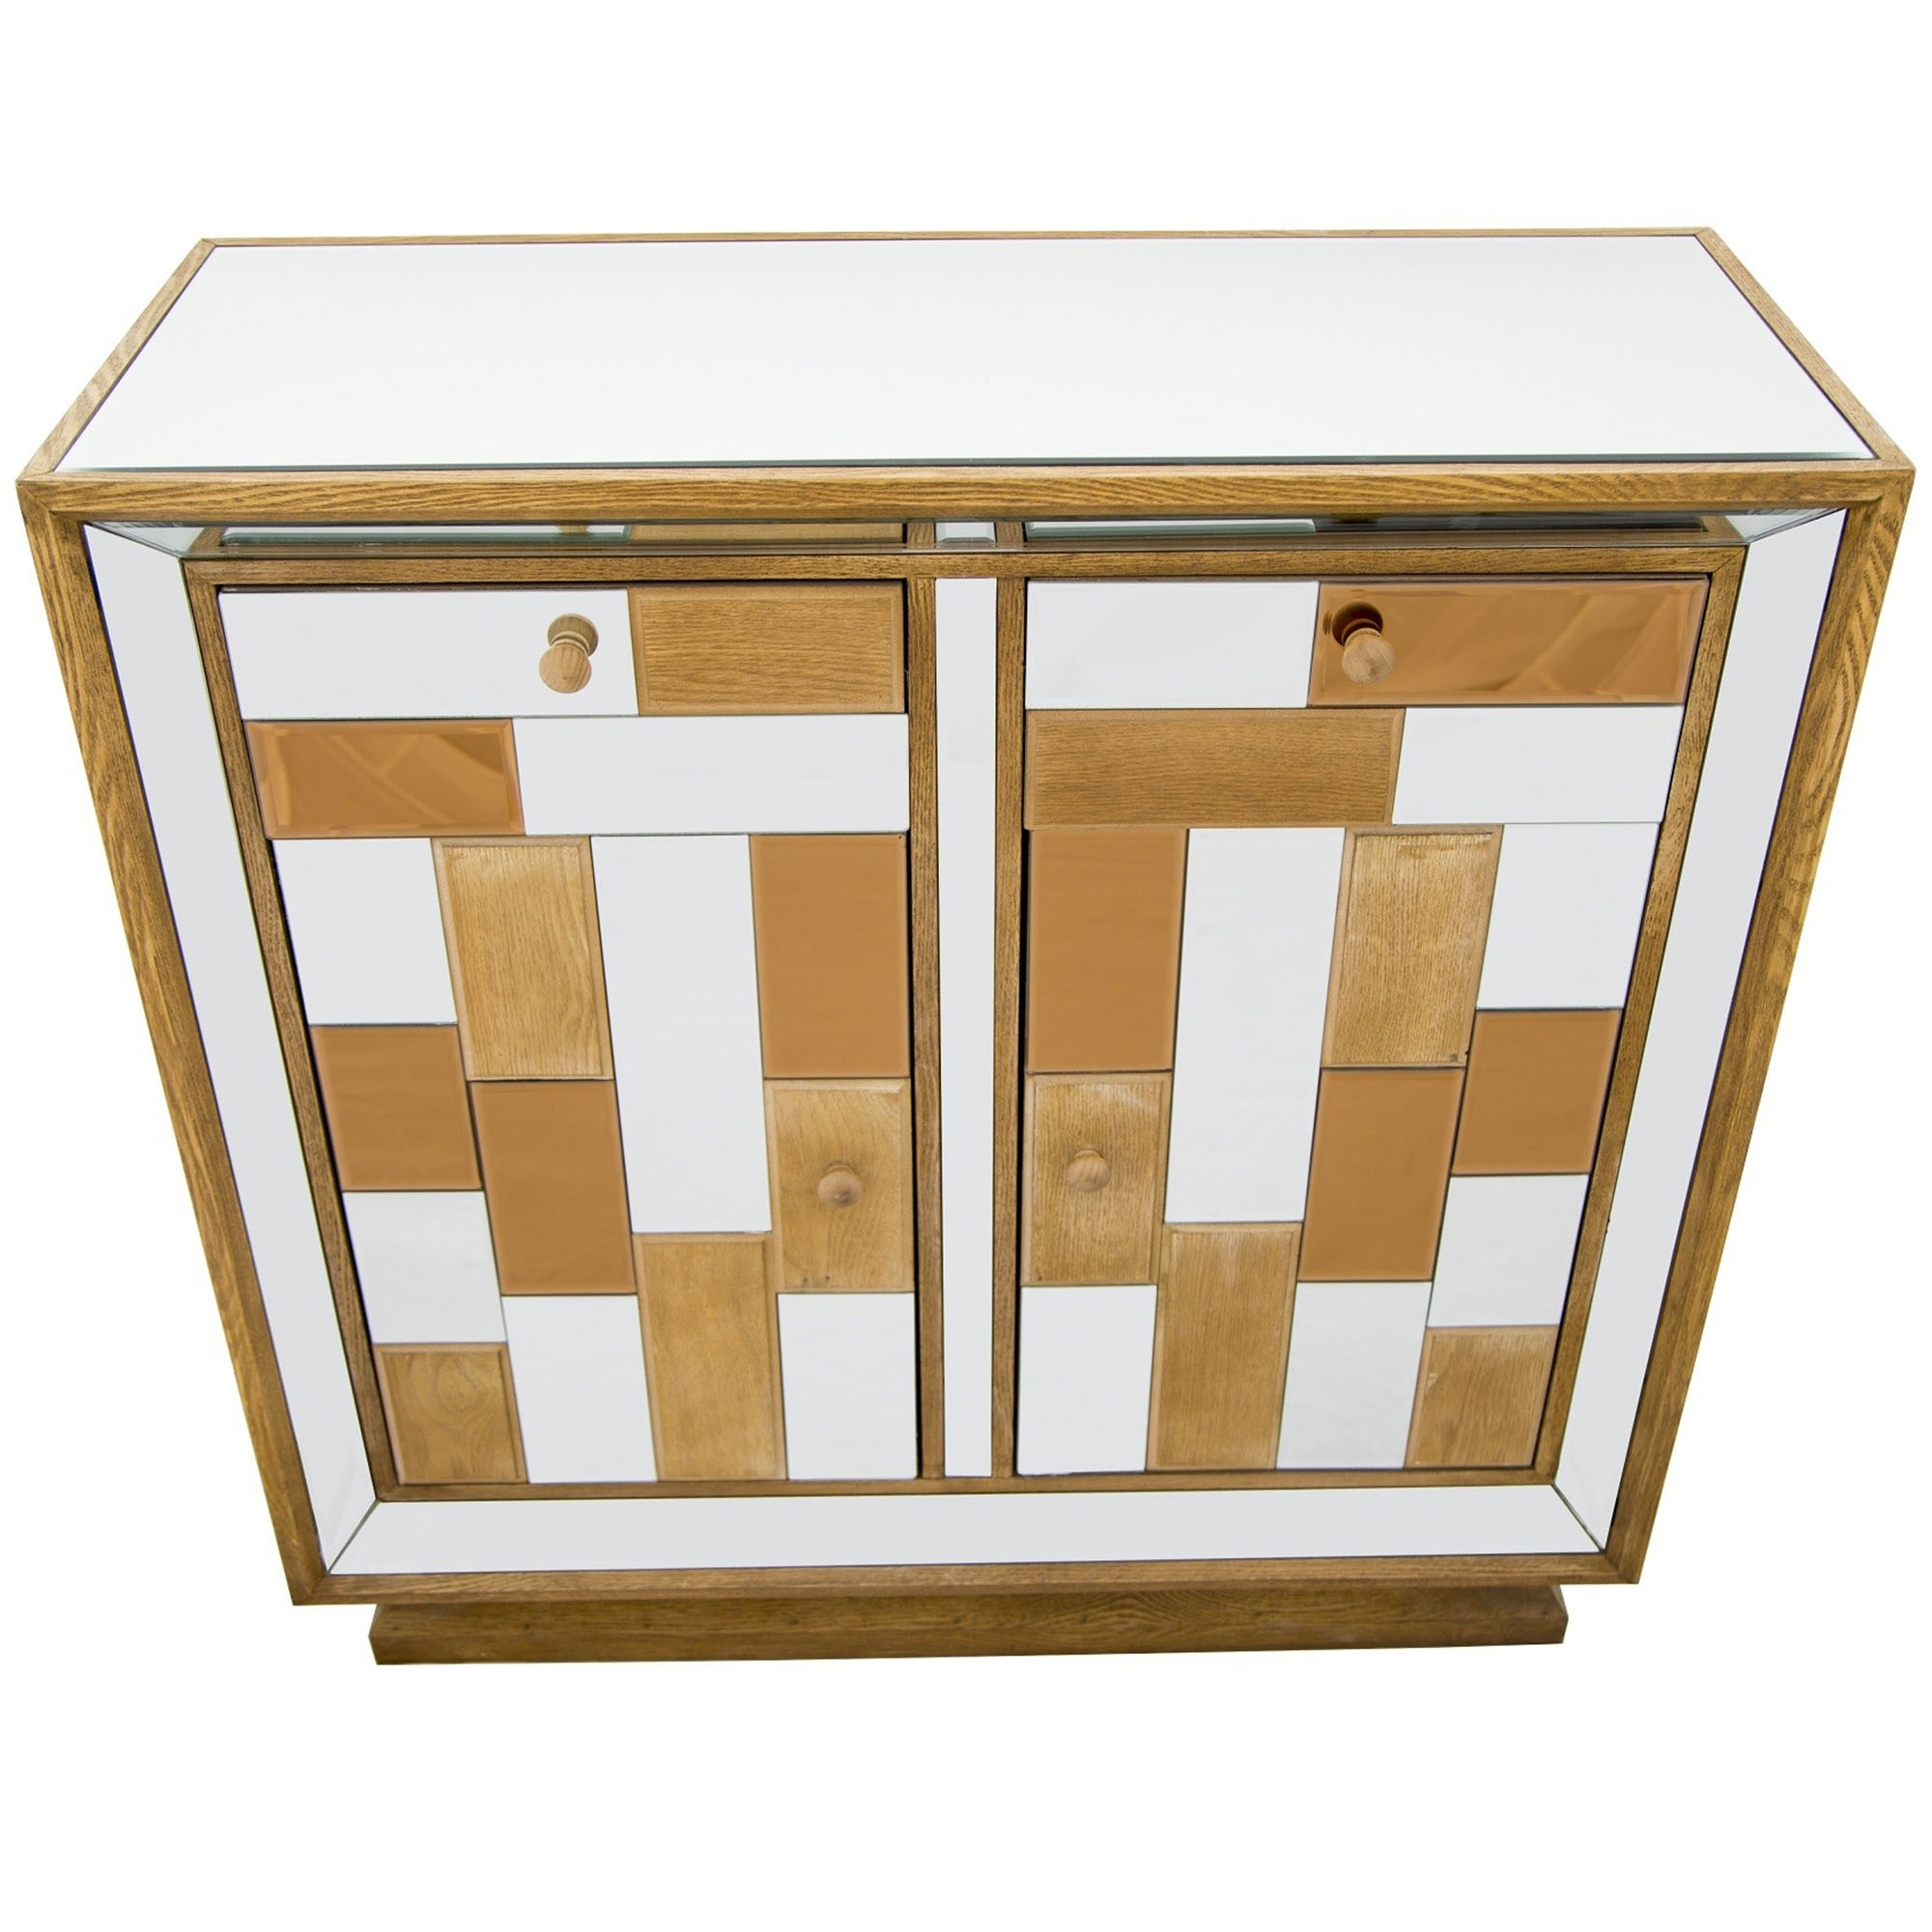 Beau Bronze Mirrored Cabinet